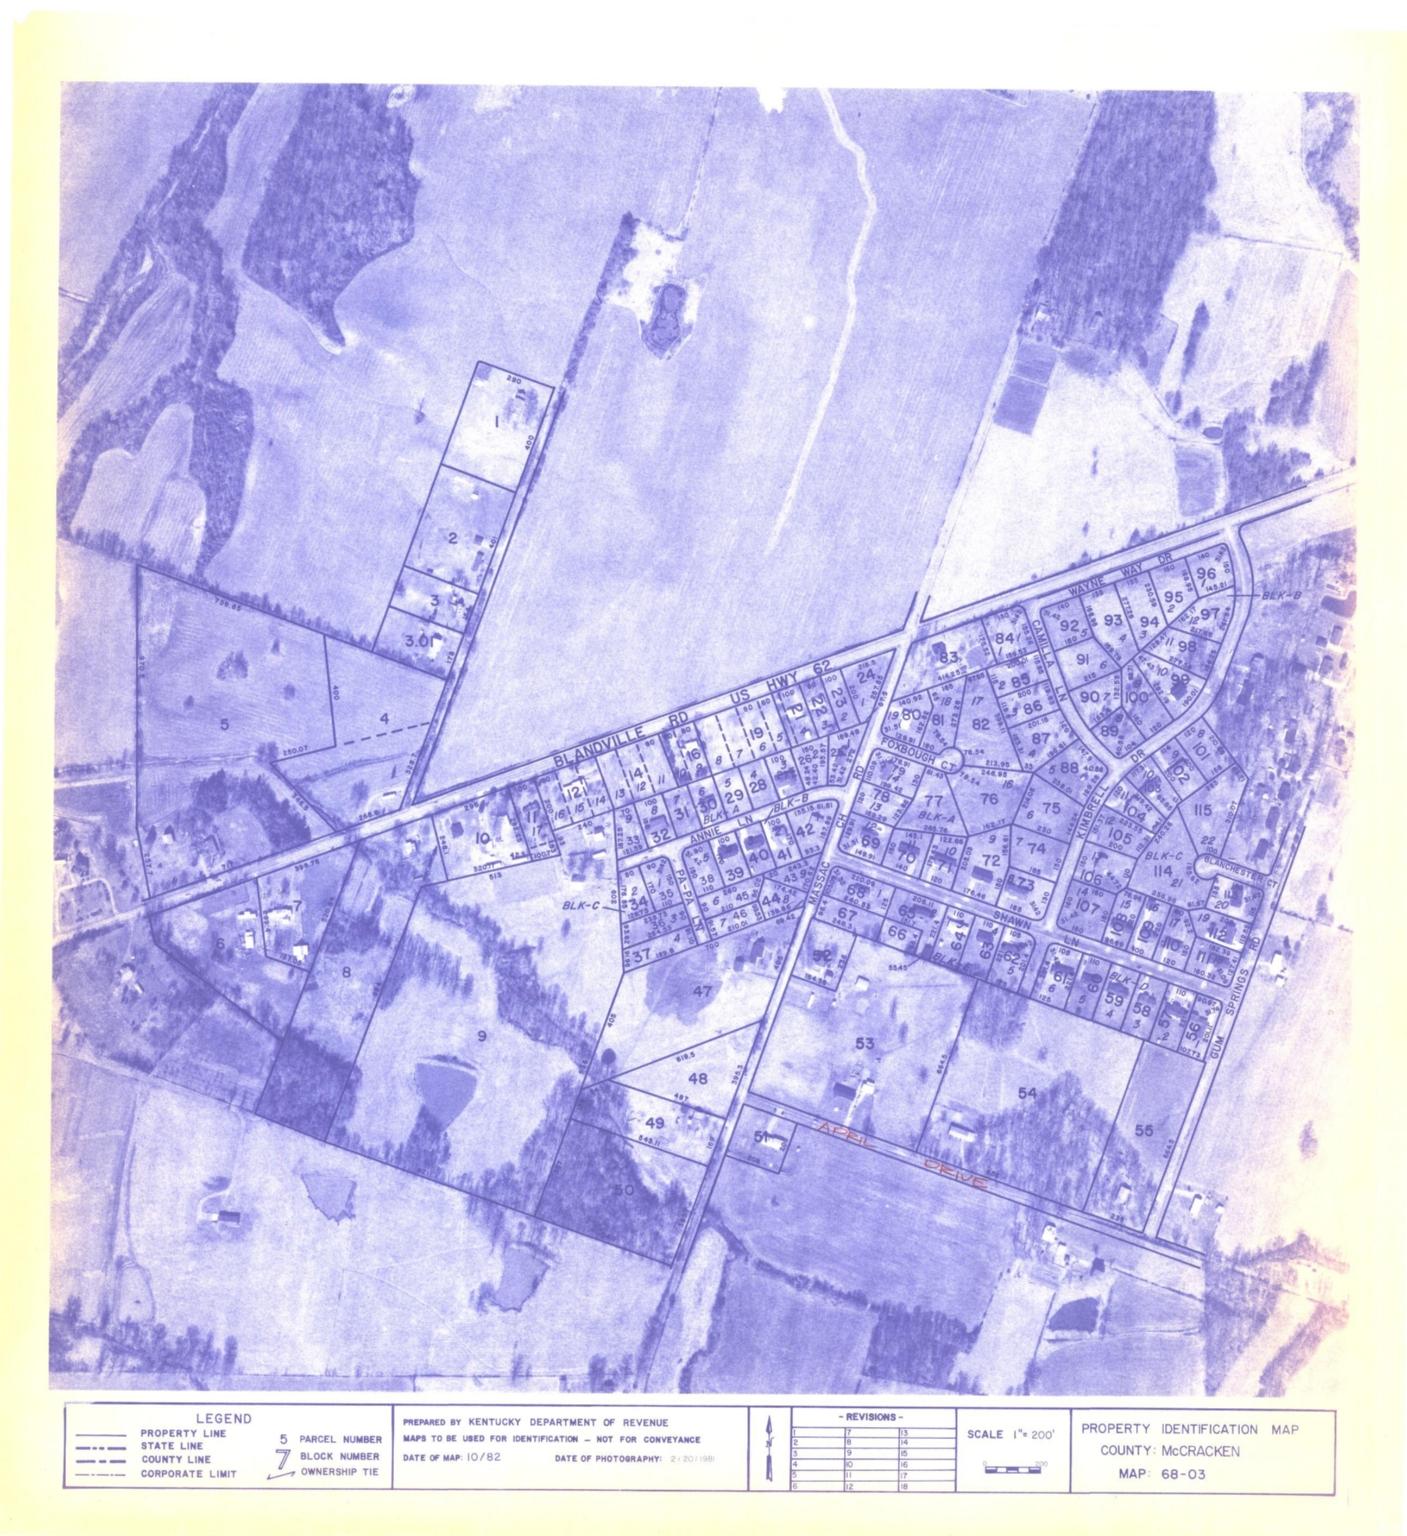 Property Identification Map McCracken County, Map 68-3